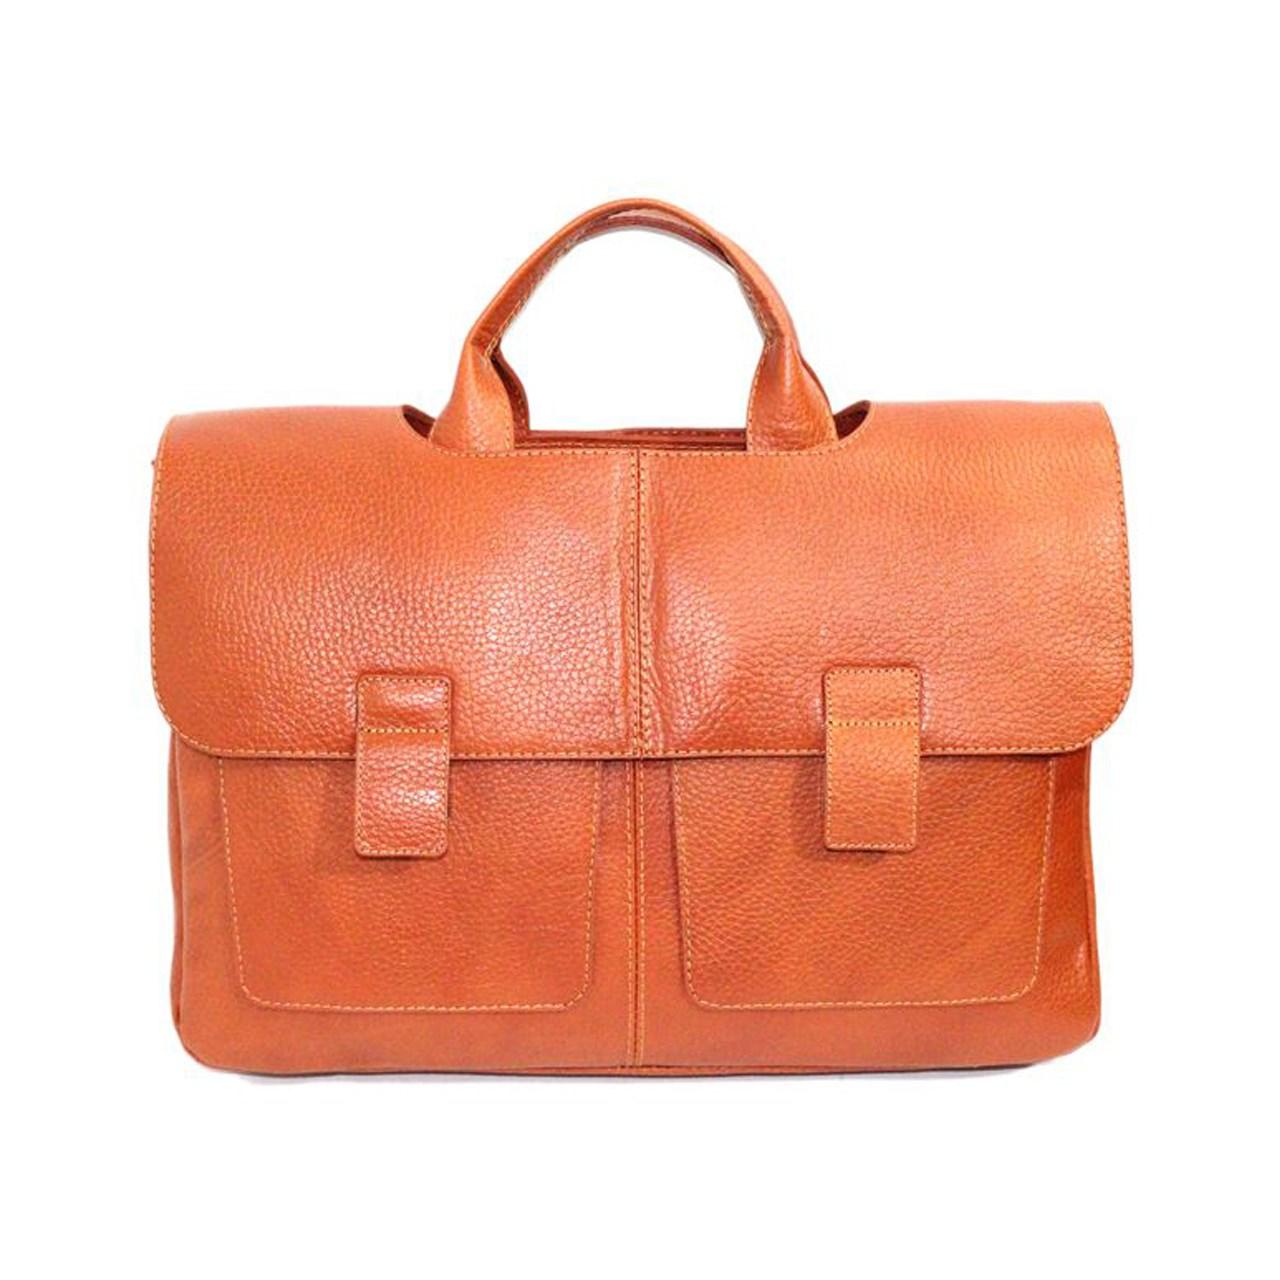 قیمت کیف اداری مردانه کد e046